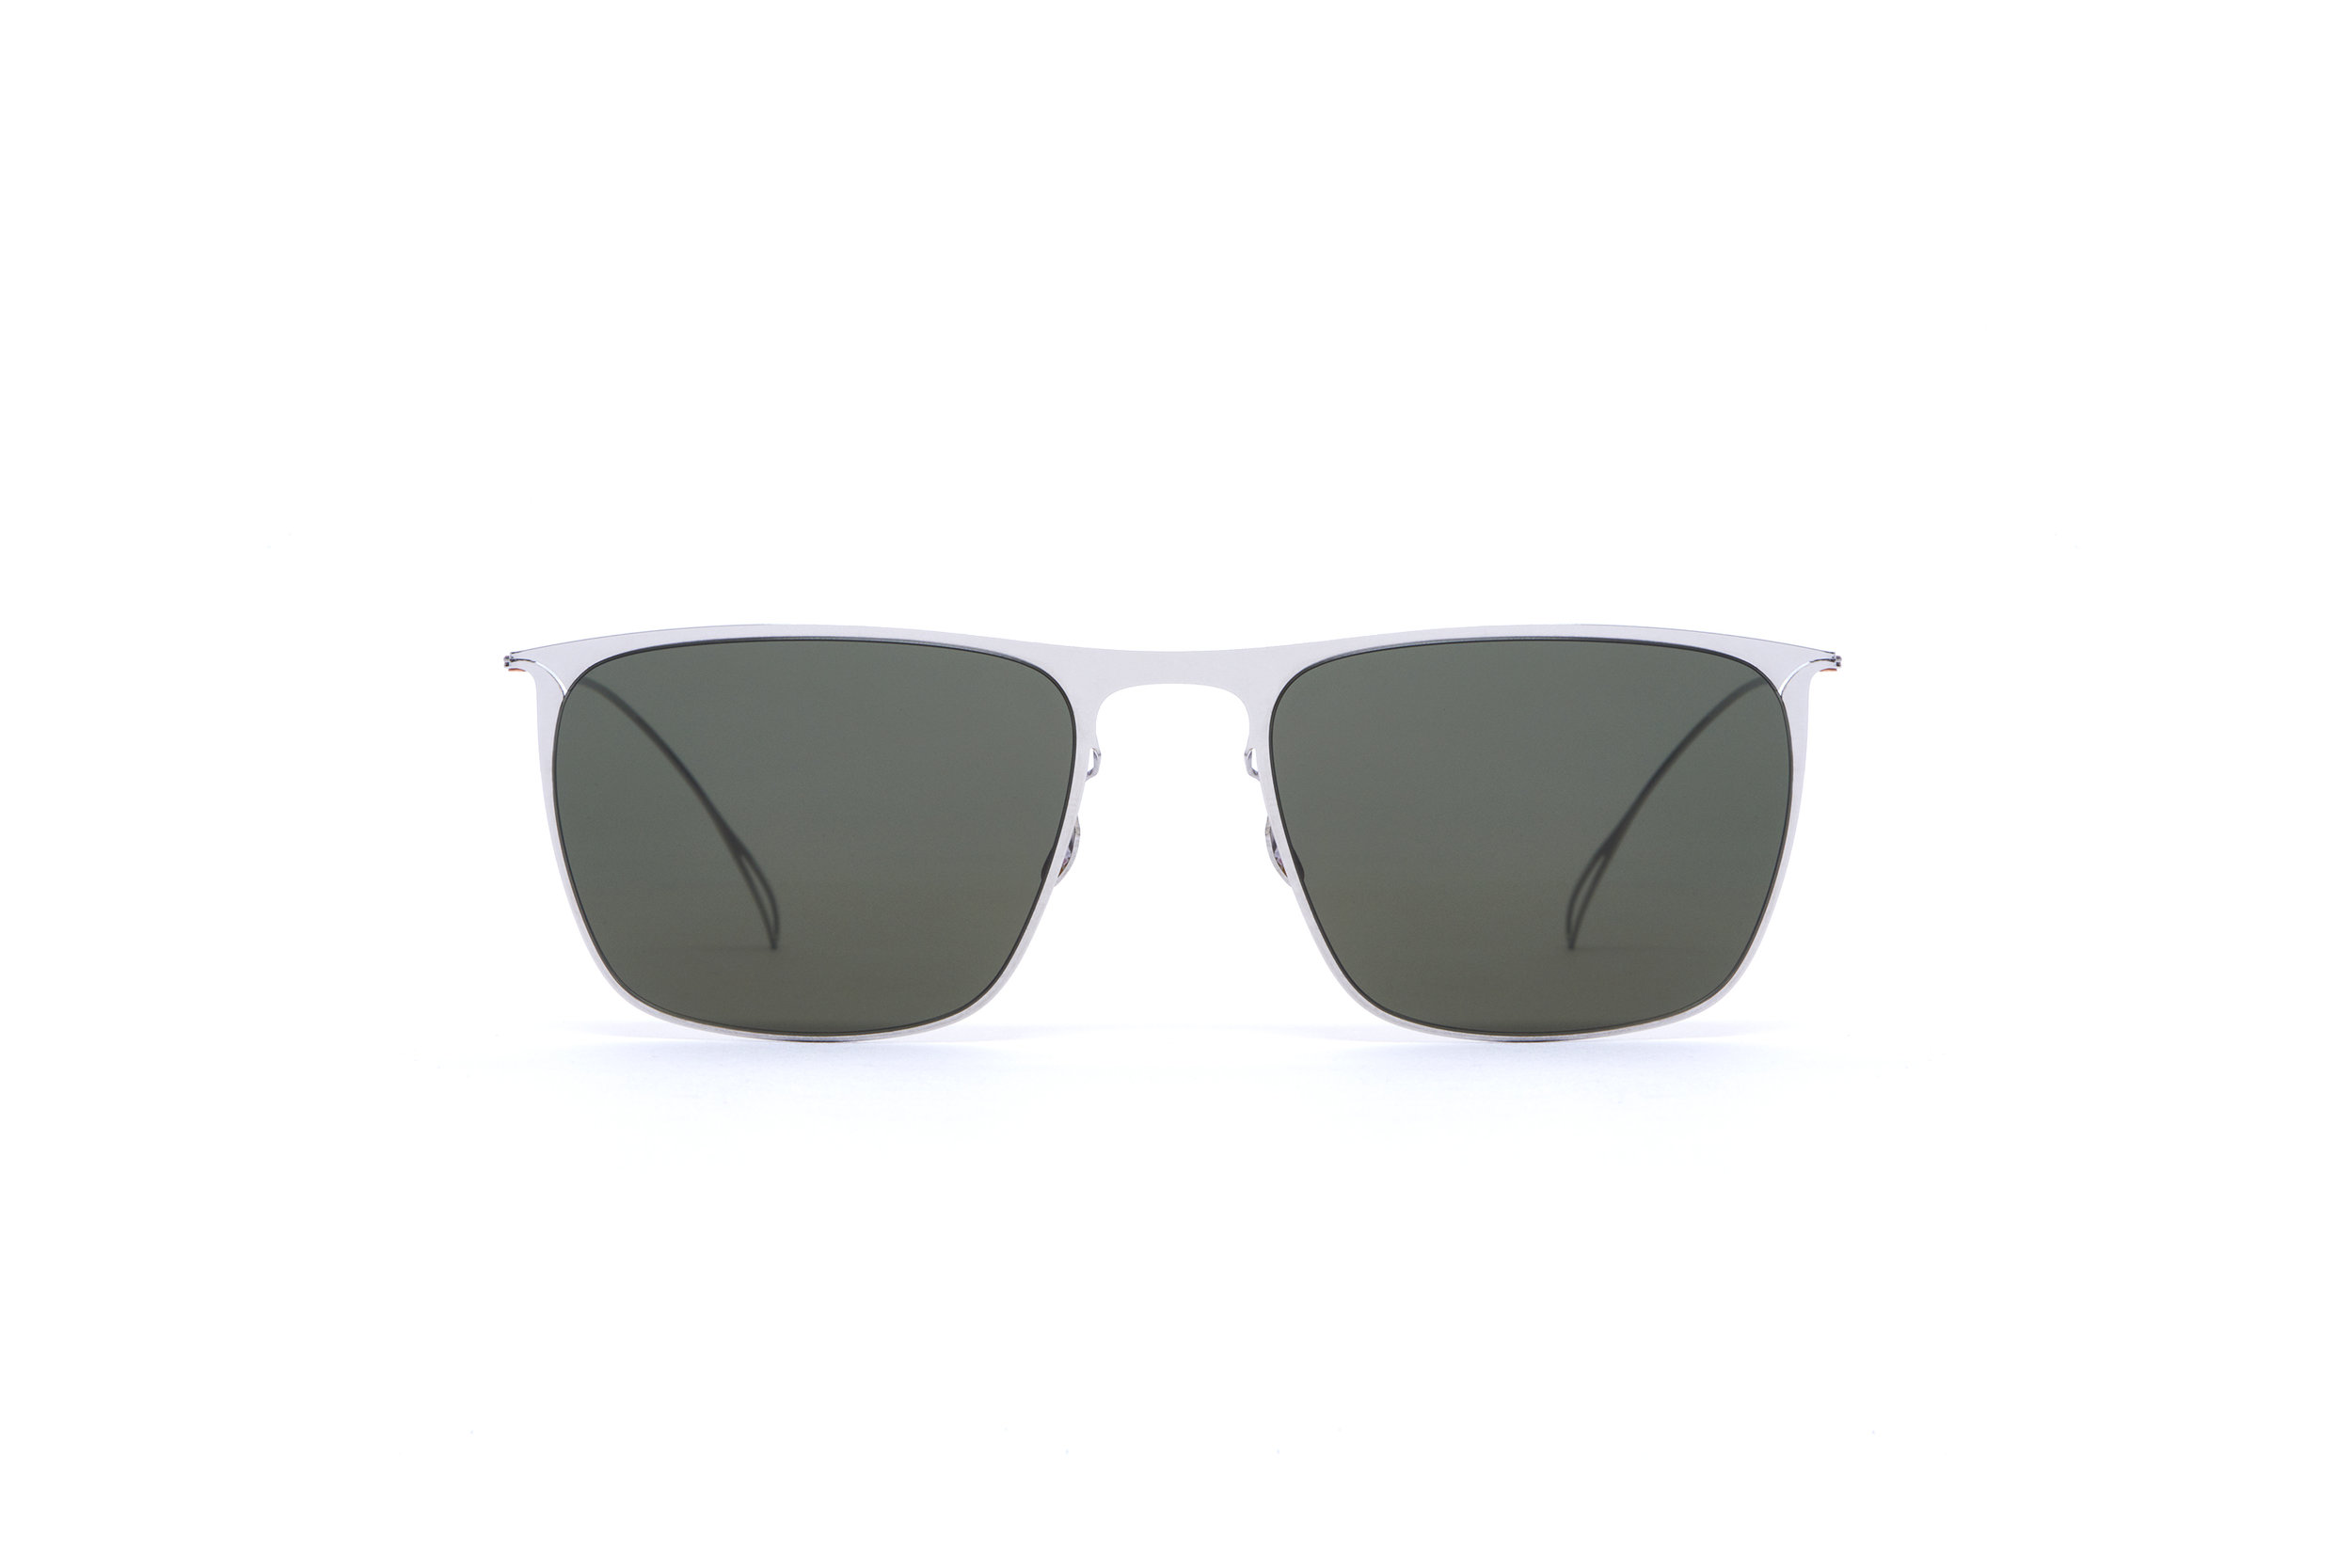 haffmans_neumeister_nyberg_silver_g15_ultralight_sunglasses_front_102466.jpg